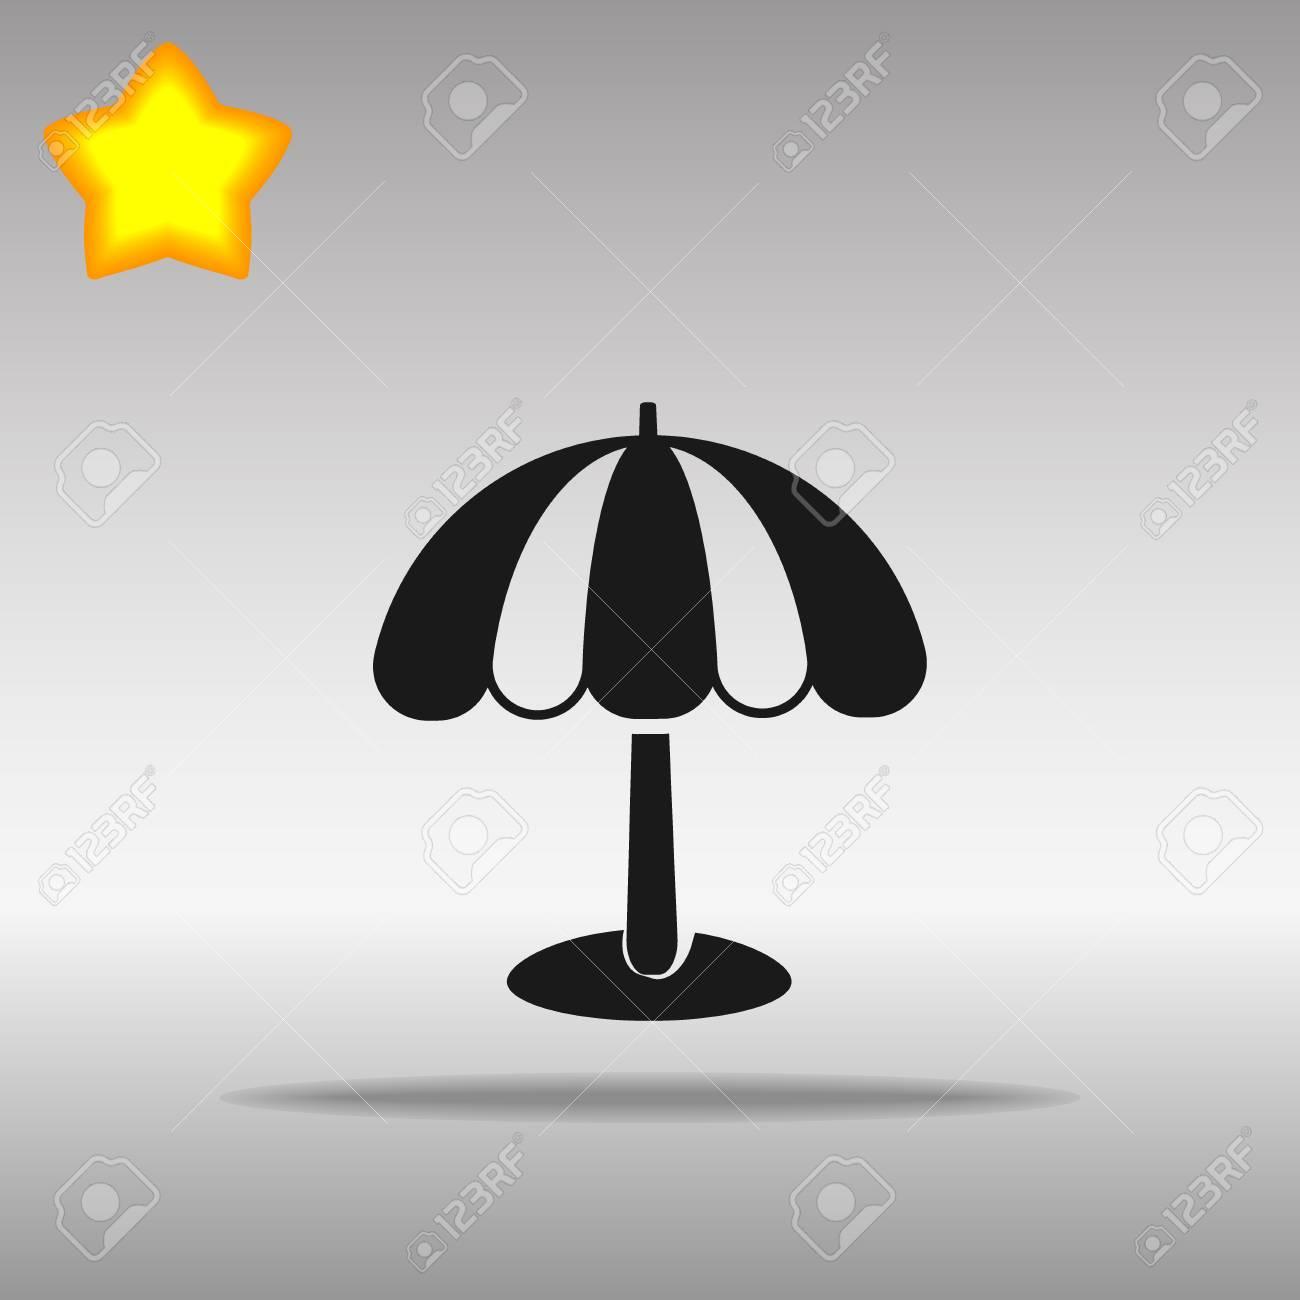 Beach umbrella black Icon button logo symbol concept high quality on the gray background - 82176370